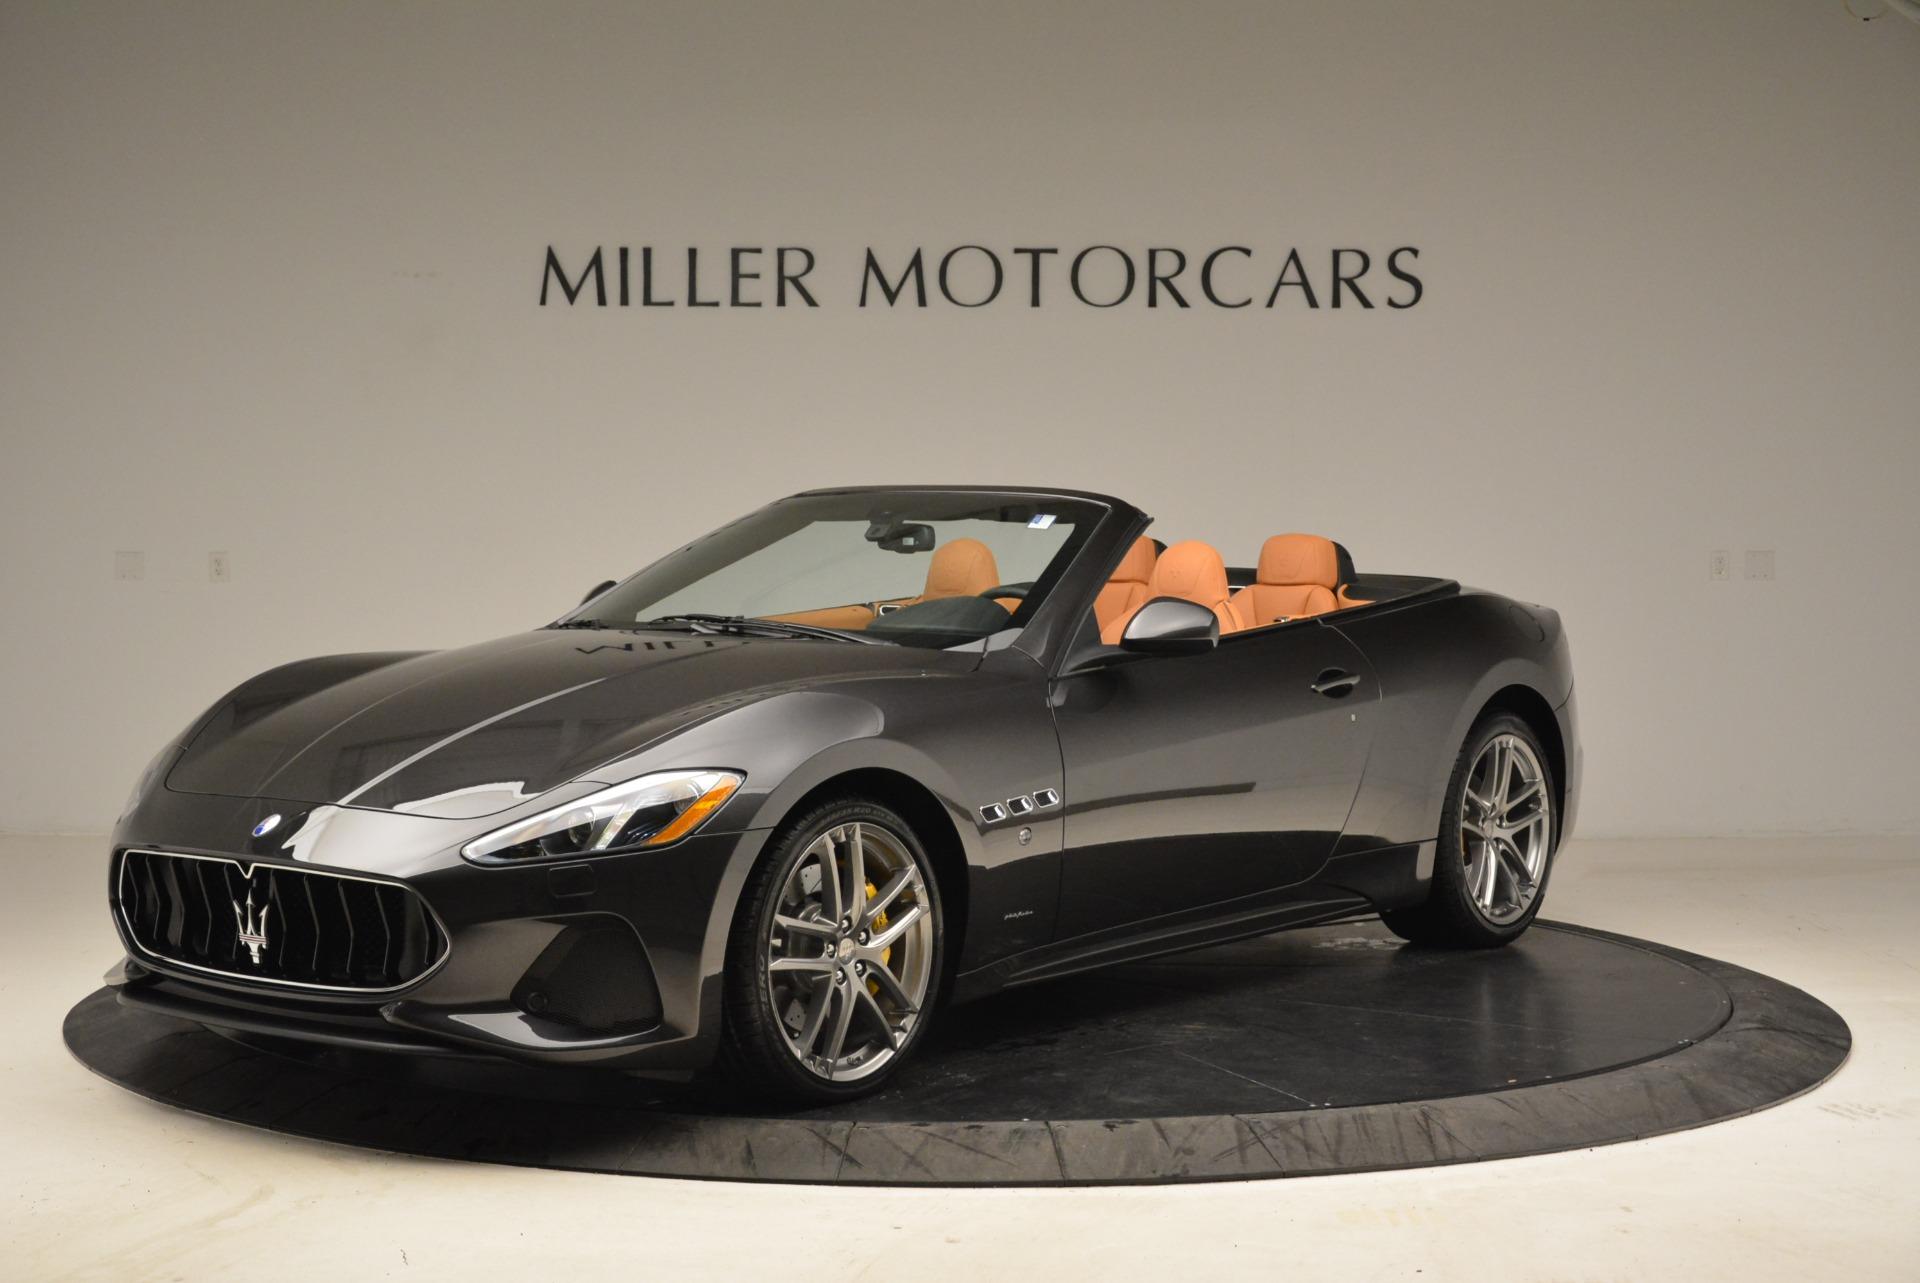 Used 2018 Maserati GranTurismo Sport Convertible for sale $92,995 at Bentley Greenwich in Greenwich CT 06830 1